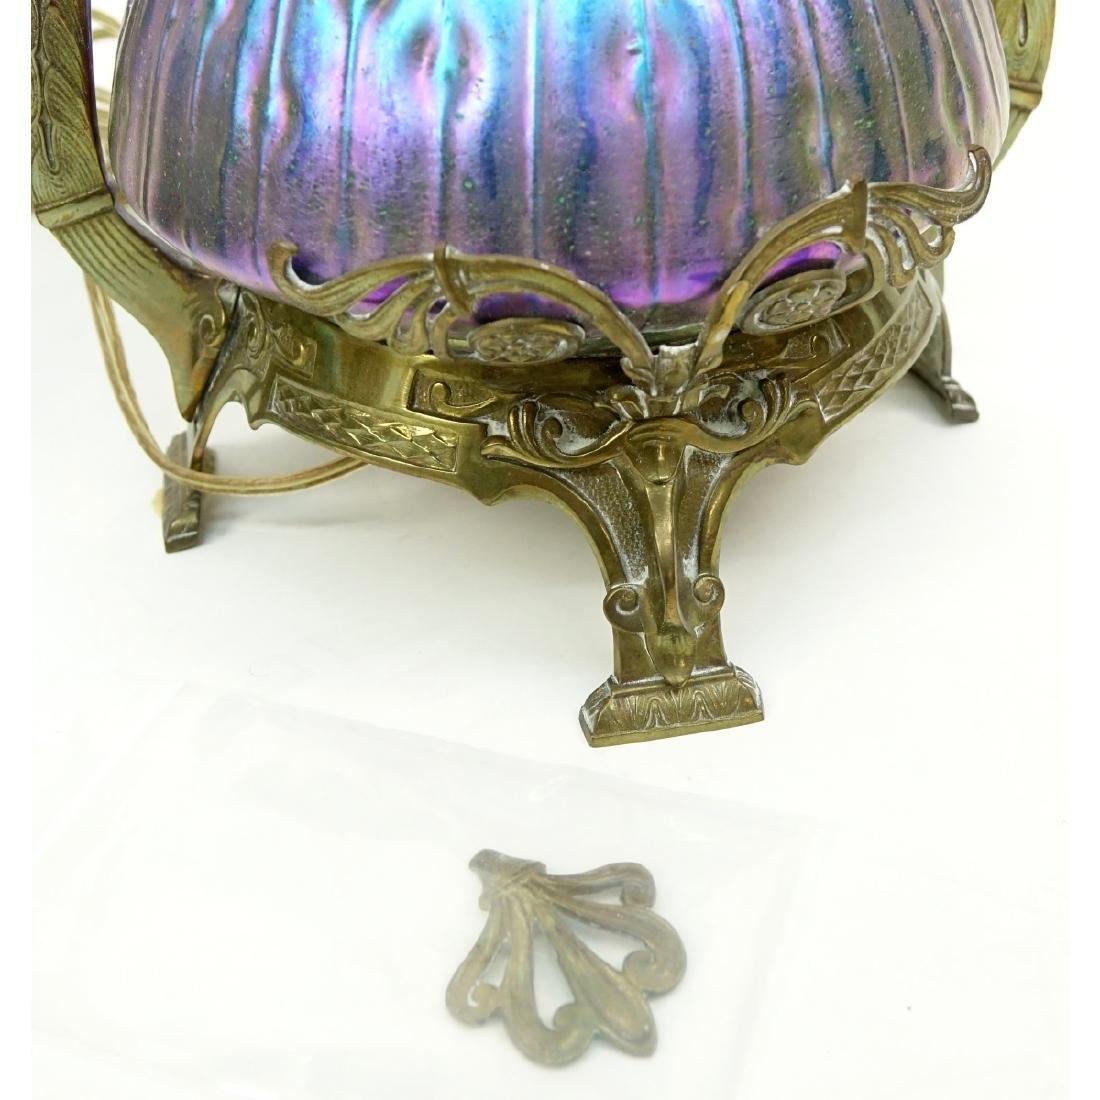 Pr Loetz Sea Urchin Art Nouveau Art Glass Lamps - 8